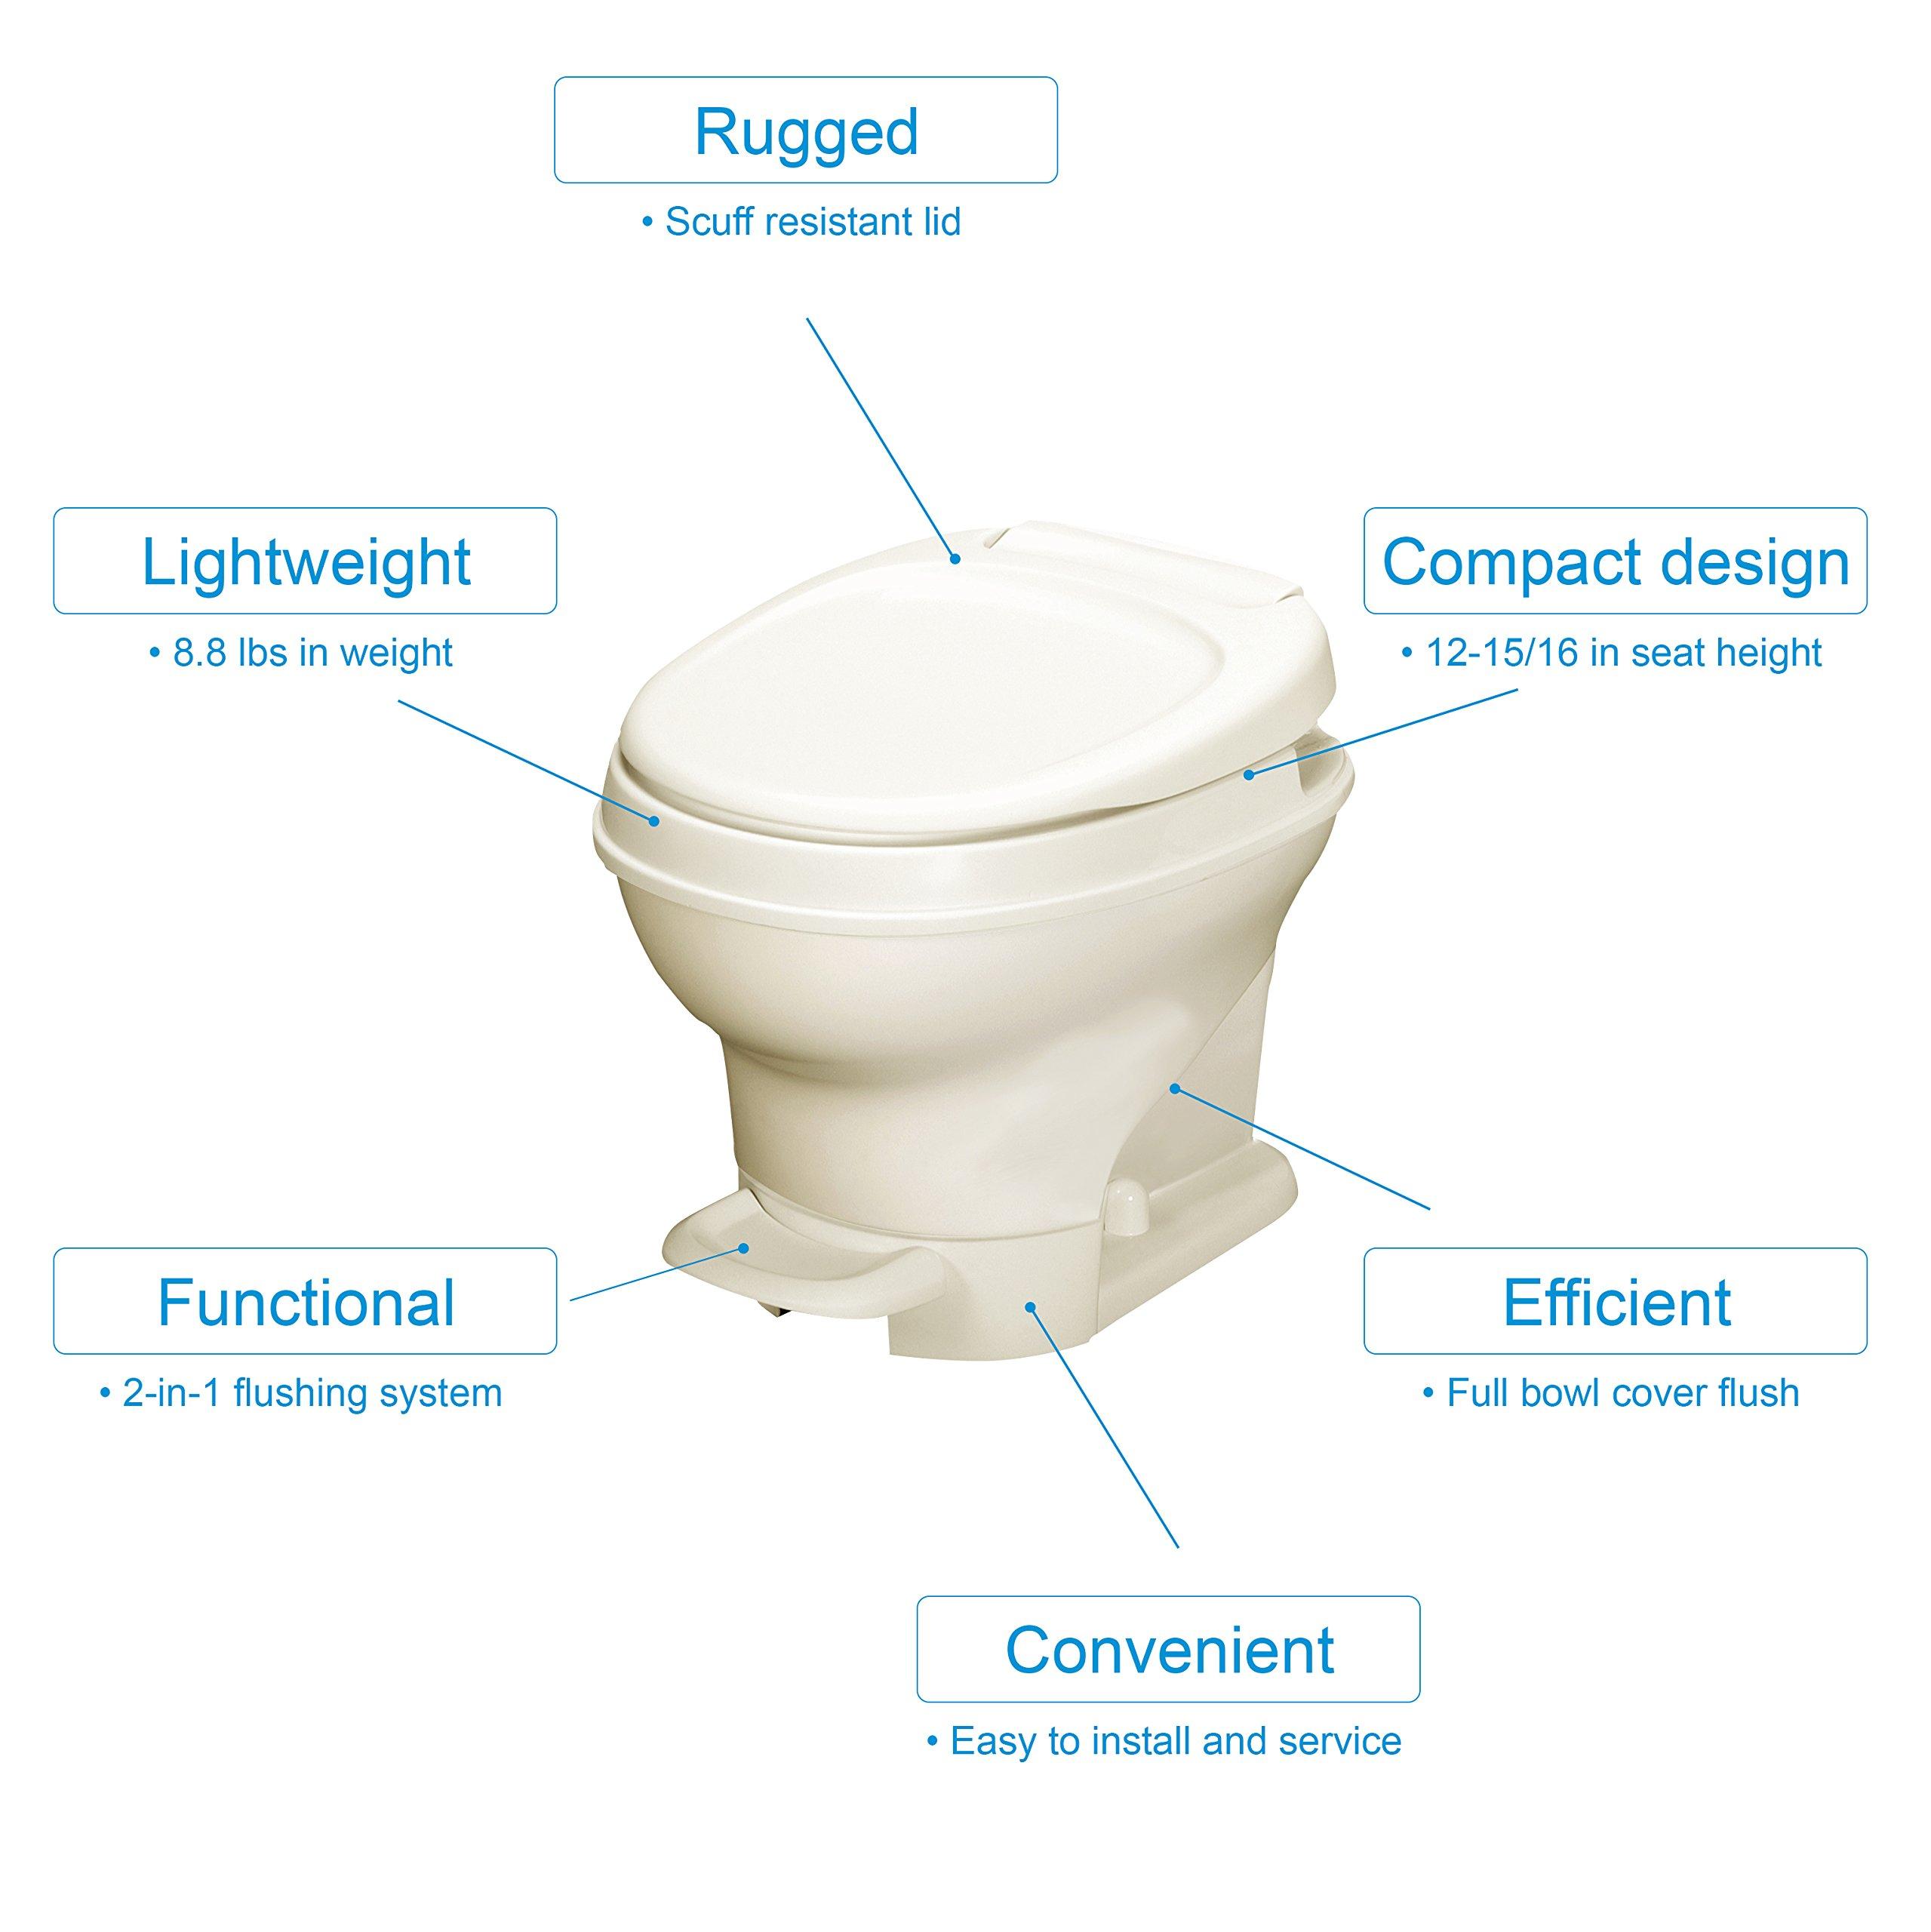 Thetford 31651 Parchment Aqua Magic V RV Toilet Pedal Flush-Low Profile-White Color-Thetford-31650 by Thetford (Image #1)